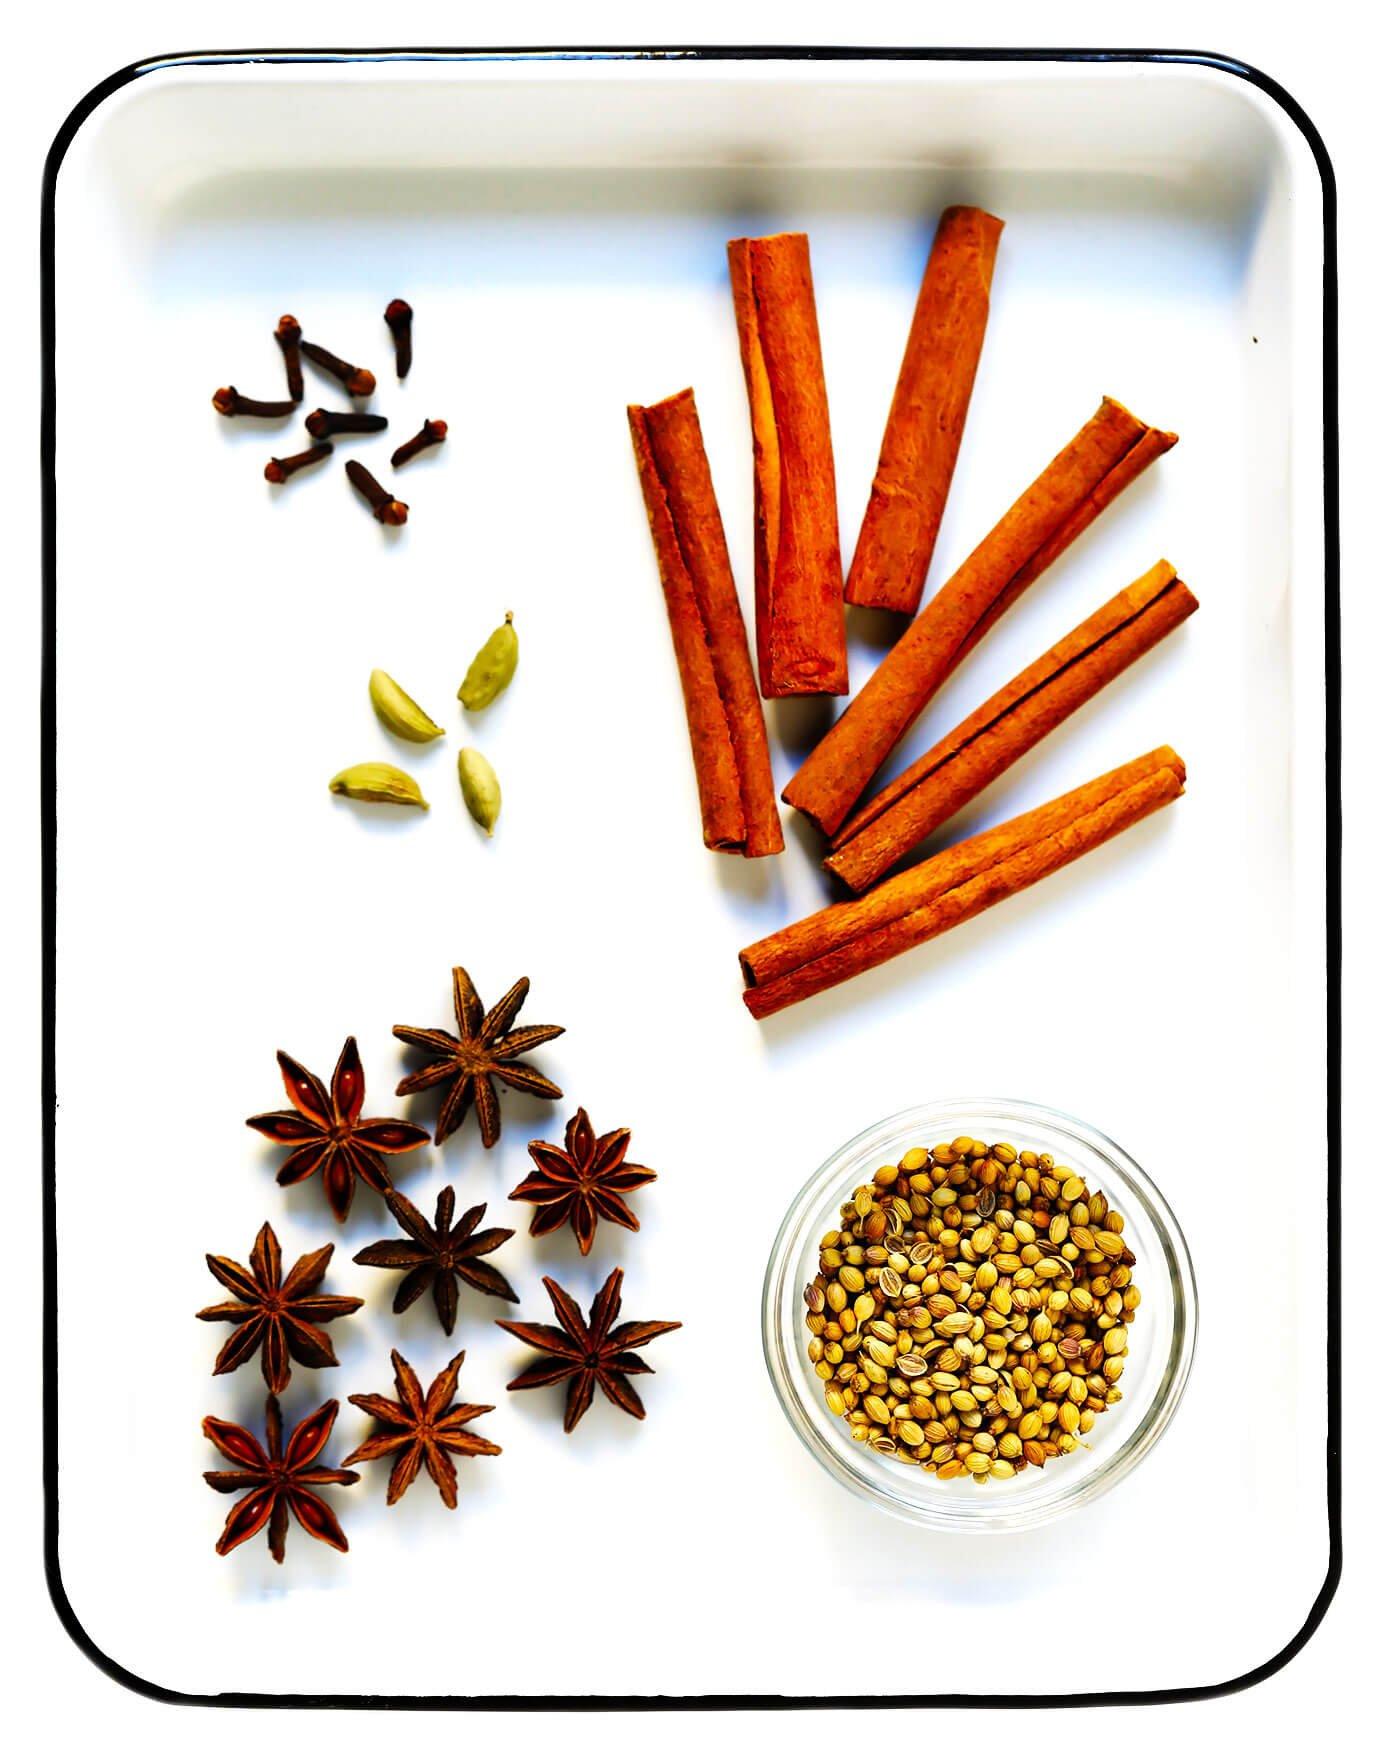 Vietnamese Pho Spices -- Cinnamon, Cloves, Cardamom, Coriander and Star Anise